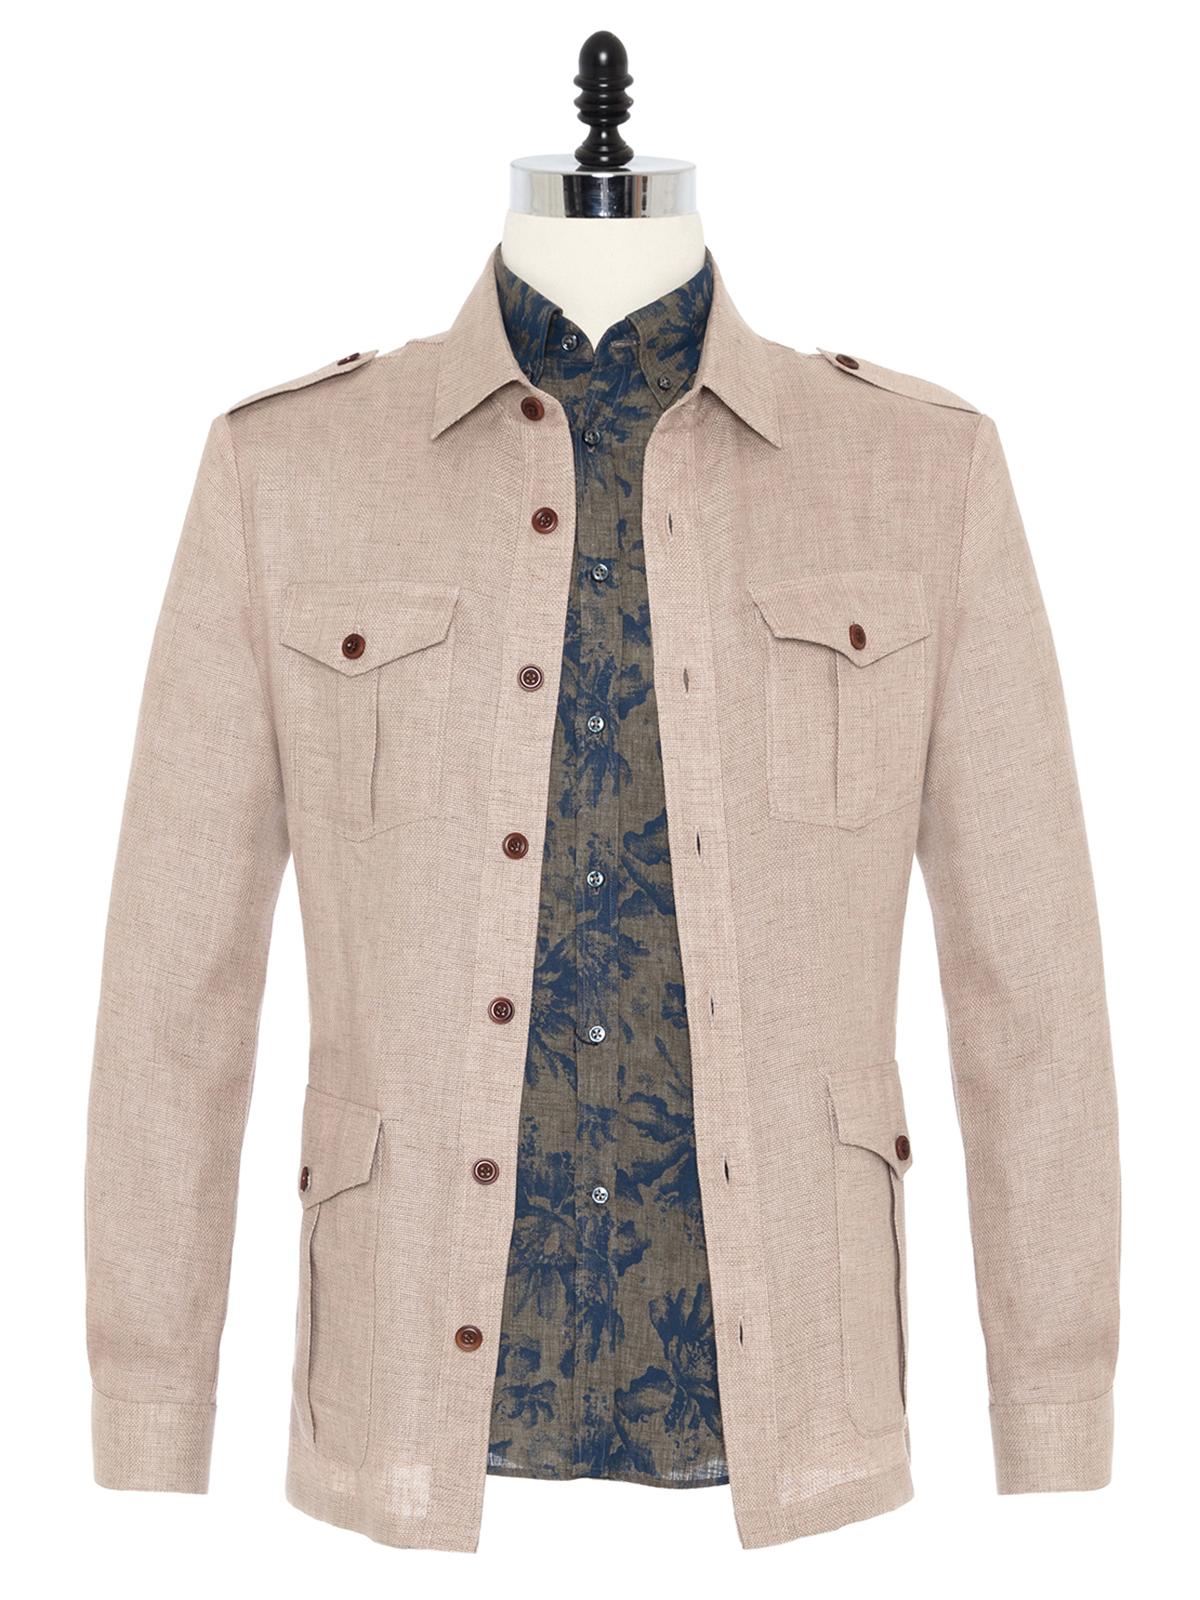 Germirli Bej Dokulu Keten Tailor Fit Ceket Gömlek